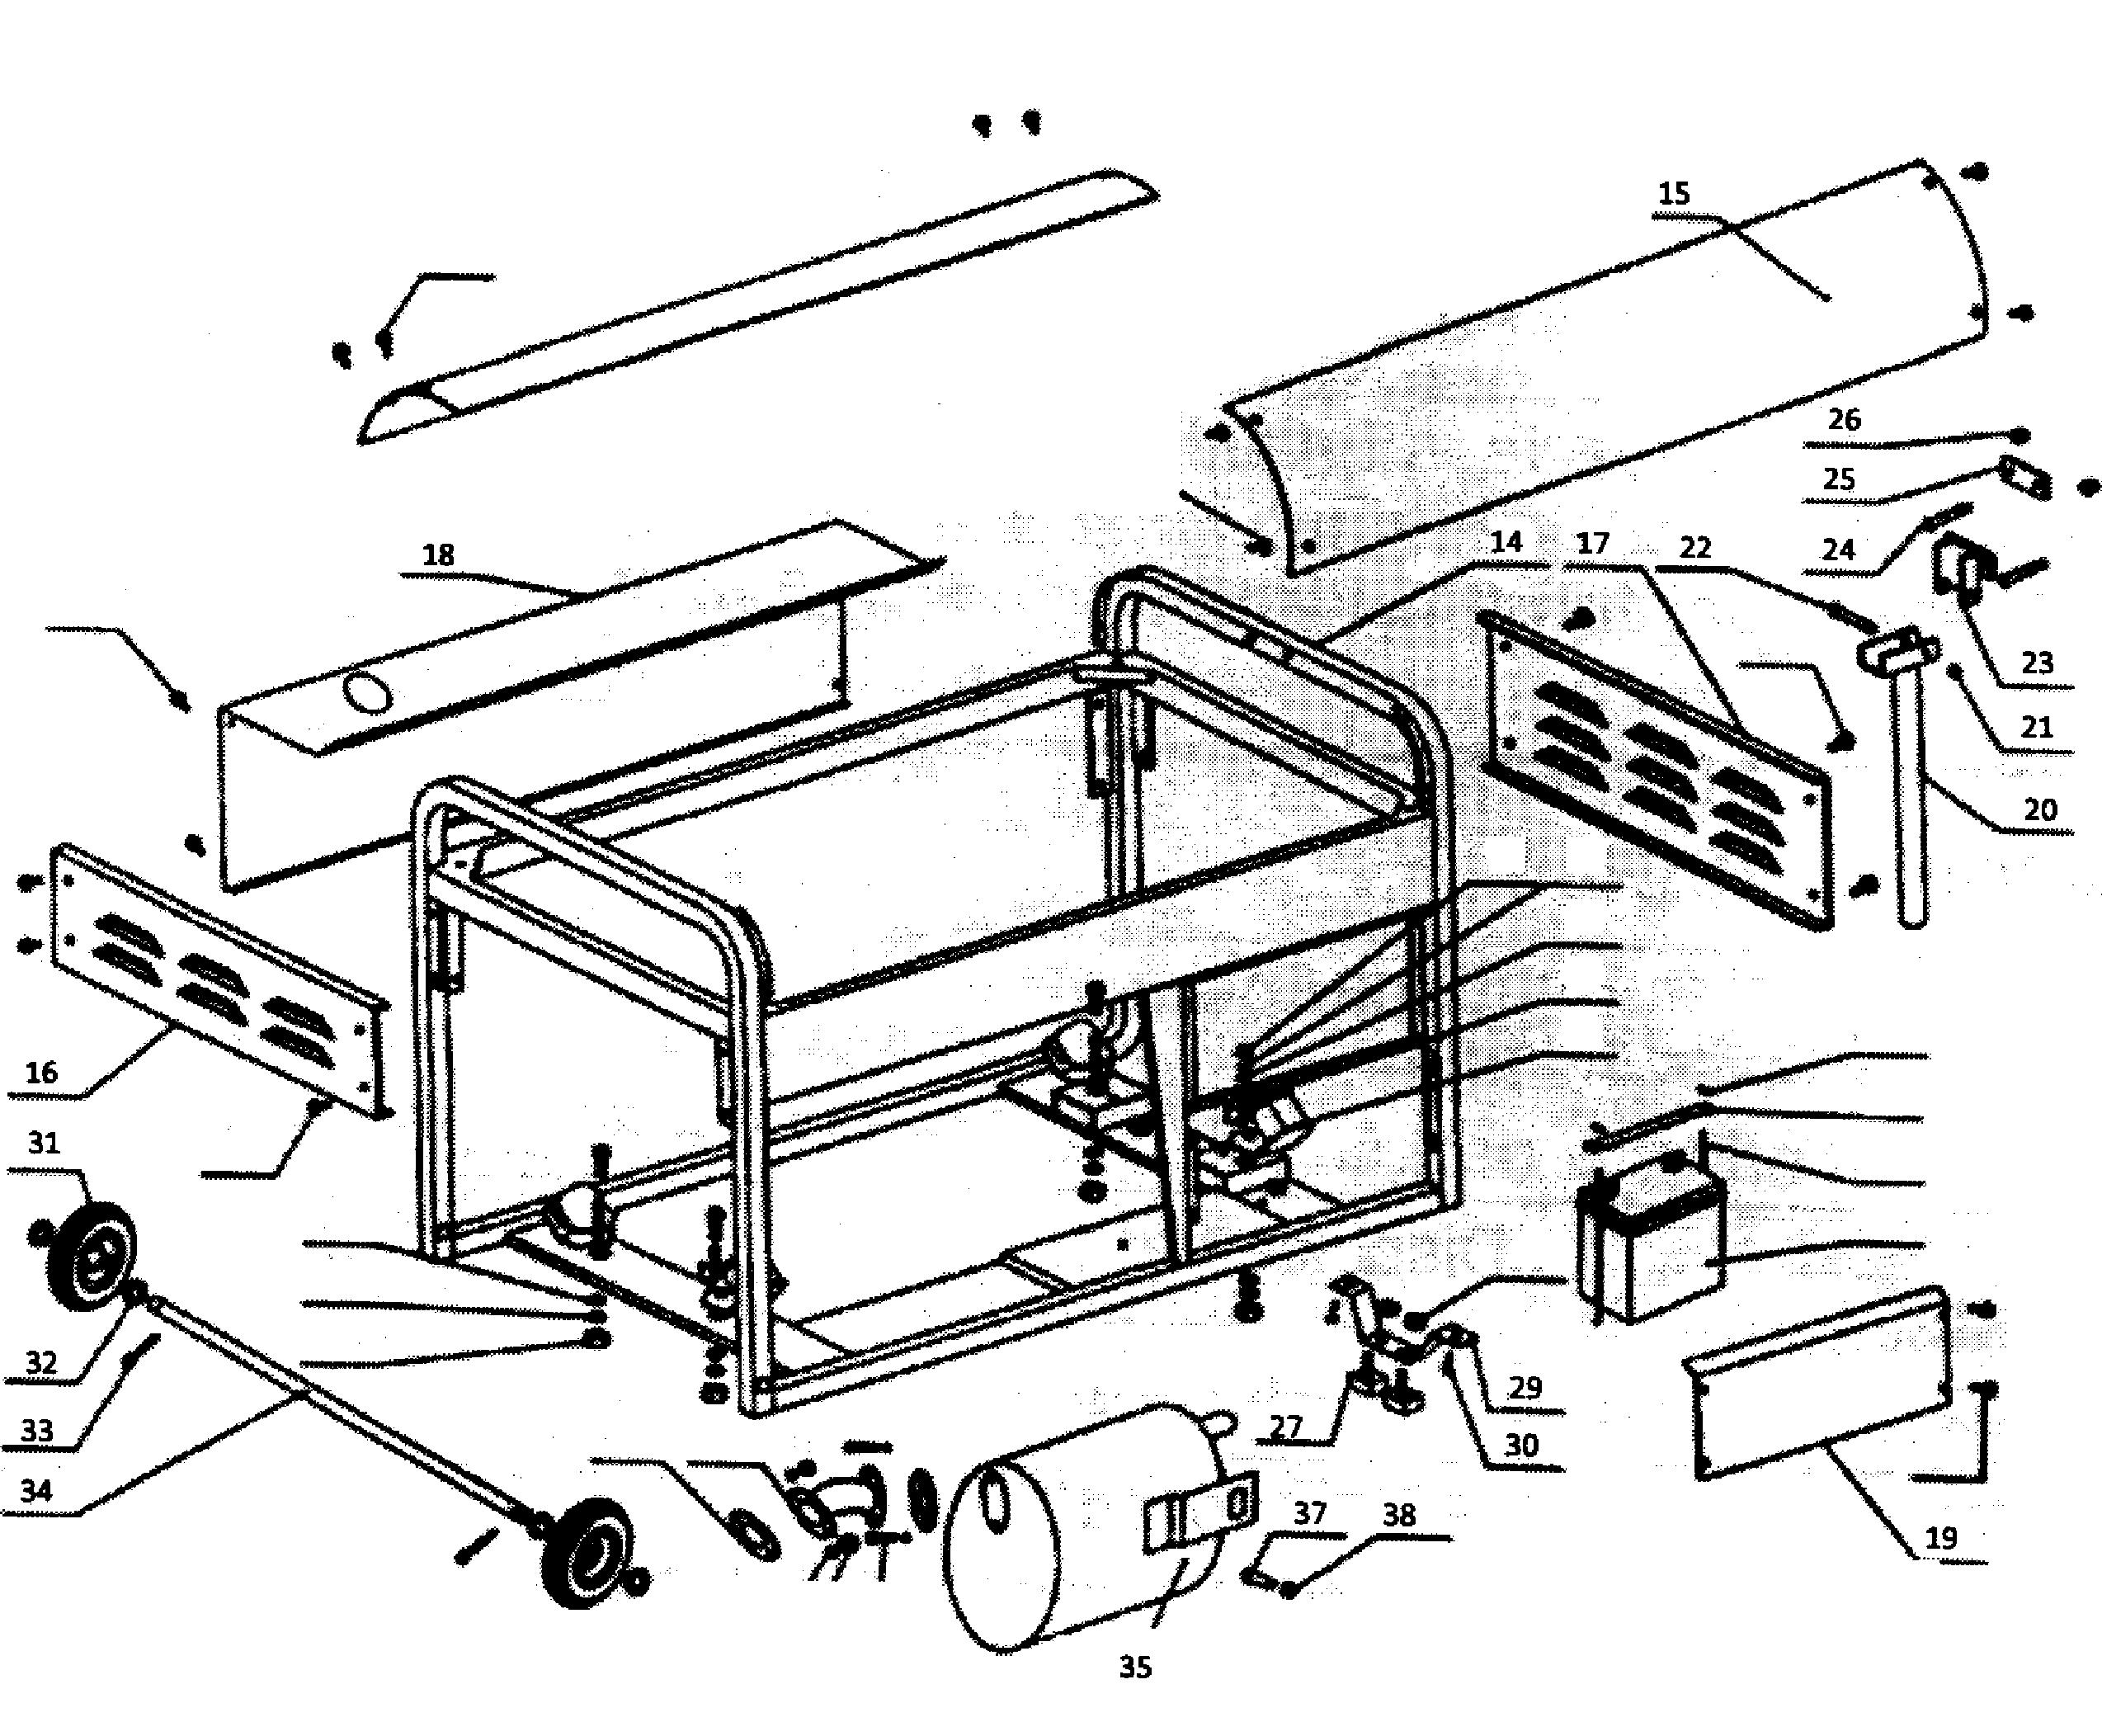 Steele model SPGG900E generator genuine parts